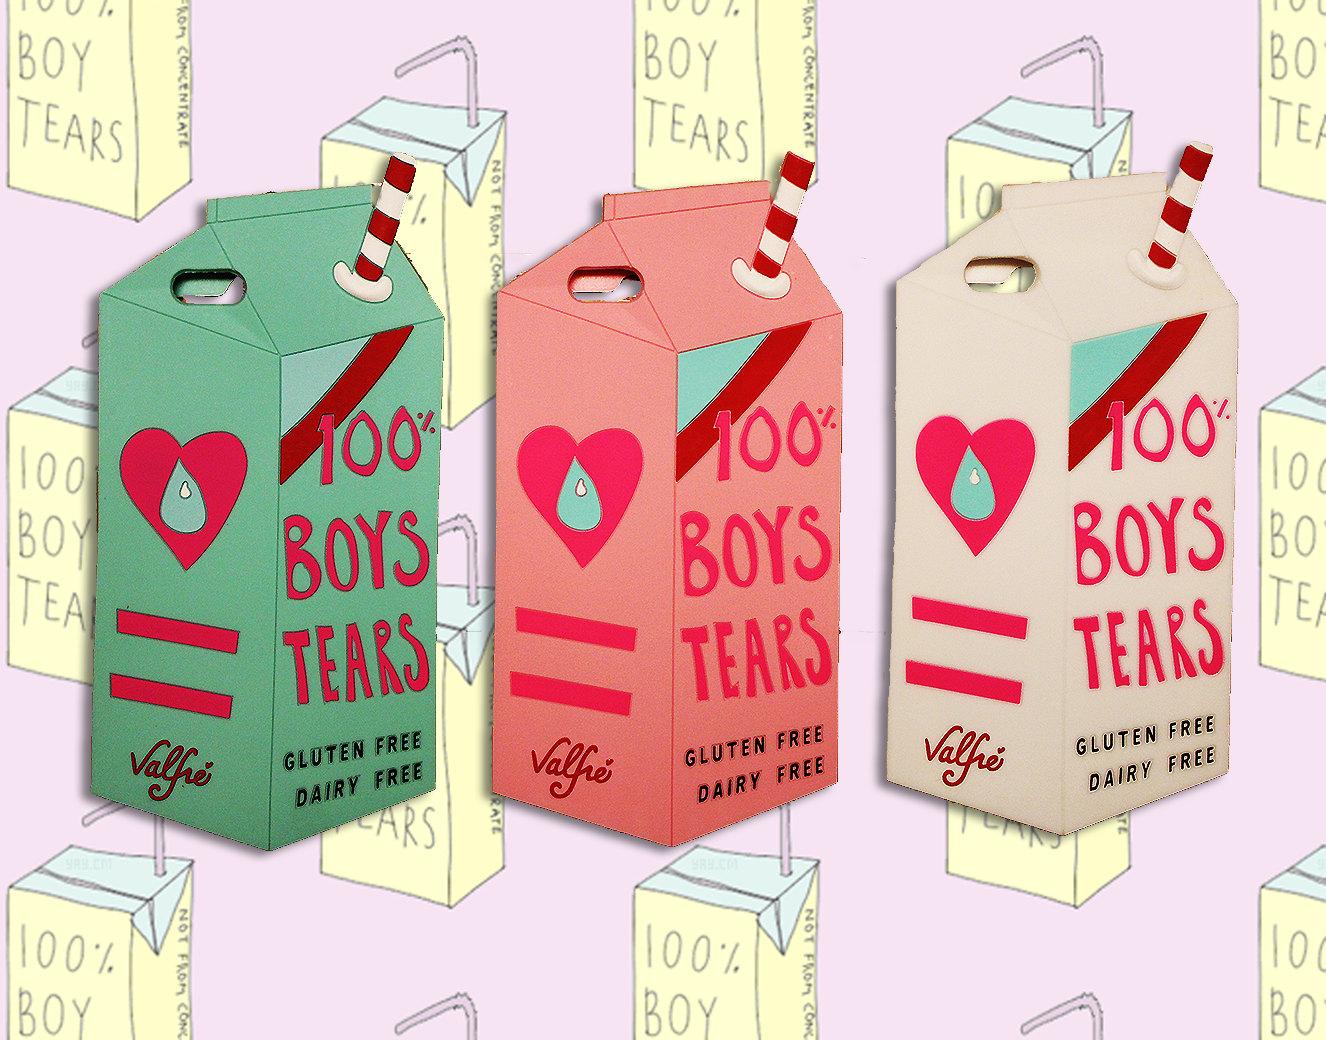 100% Boys Tears Milk Box / Carton 3D Cell Phone Case ~ iPhone 6 Plus